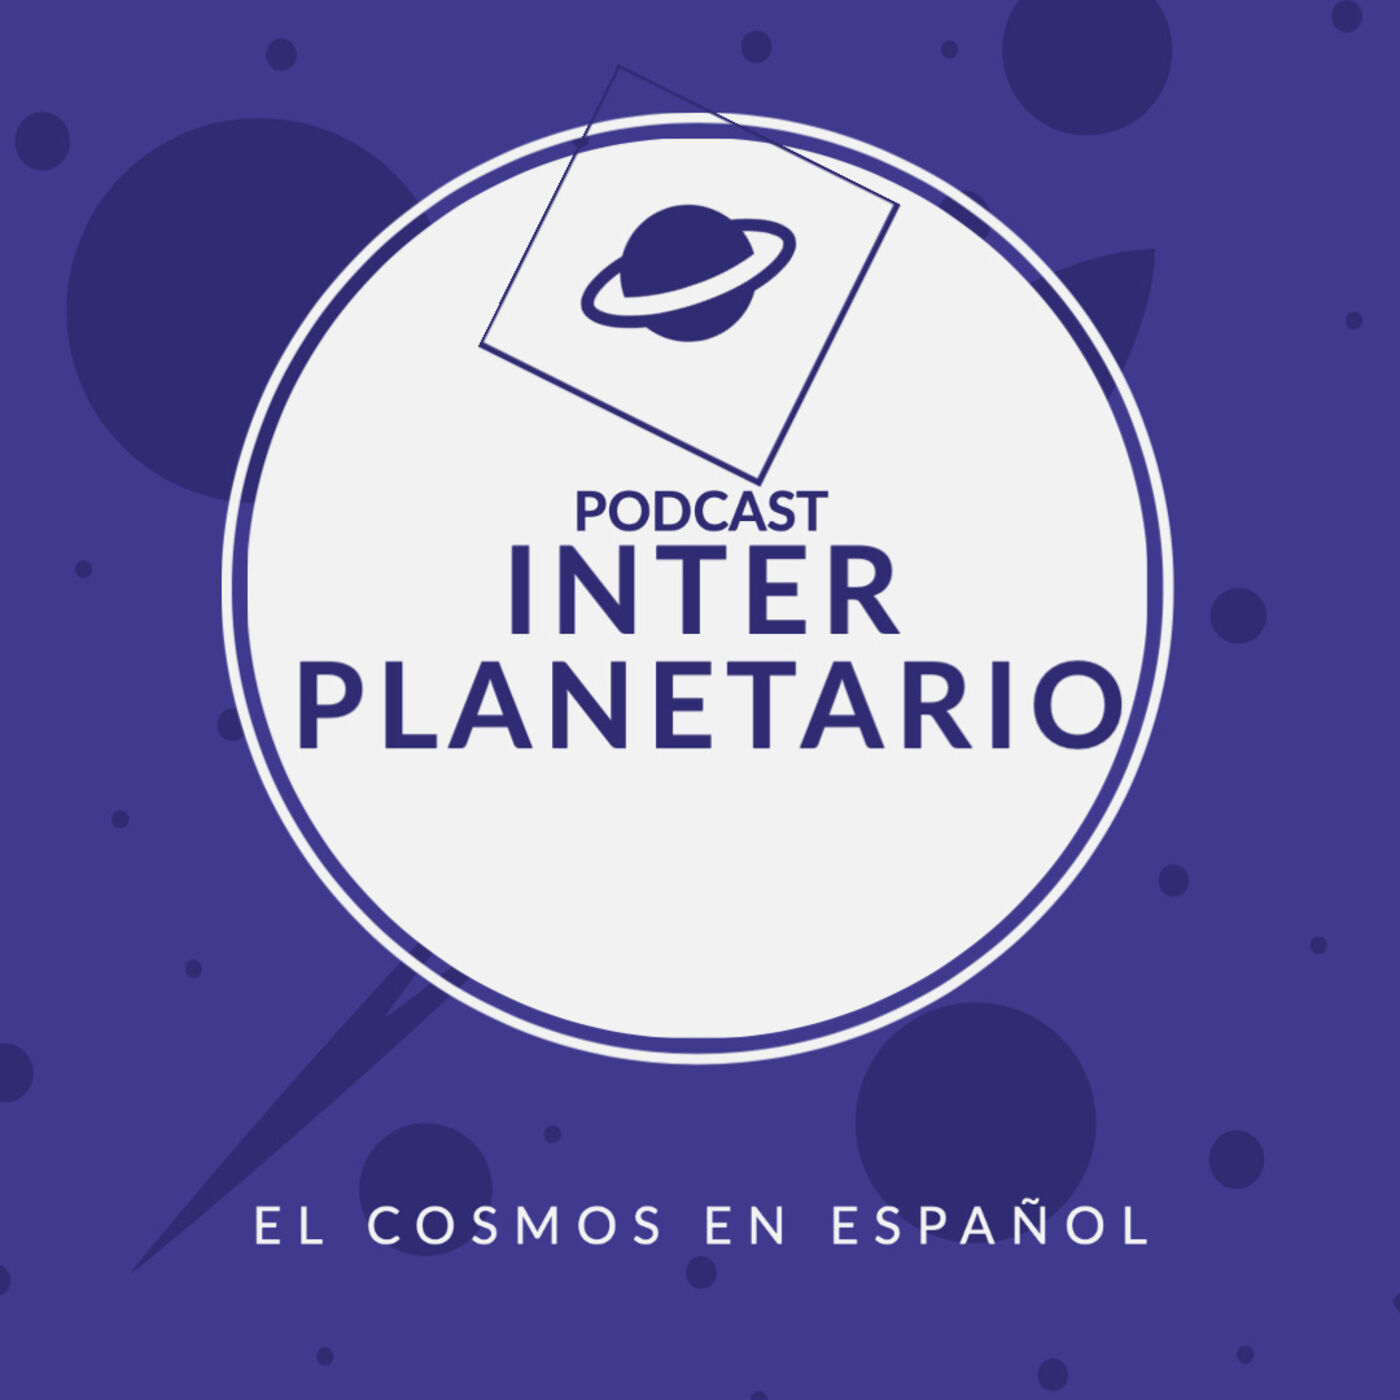 Interplanetario 0101 - Yanina Hallak - Ingeniera y emprendedora